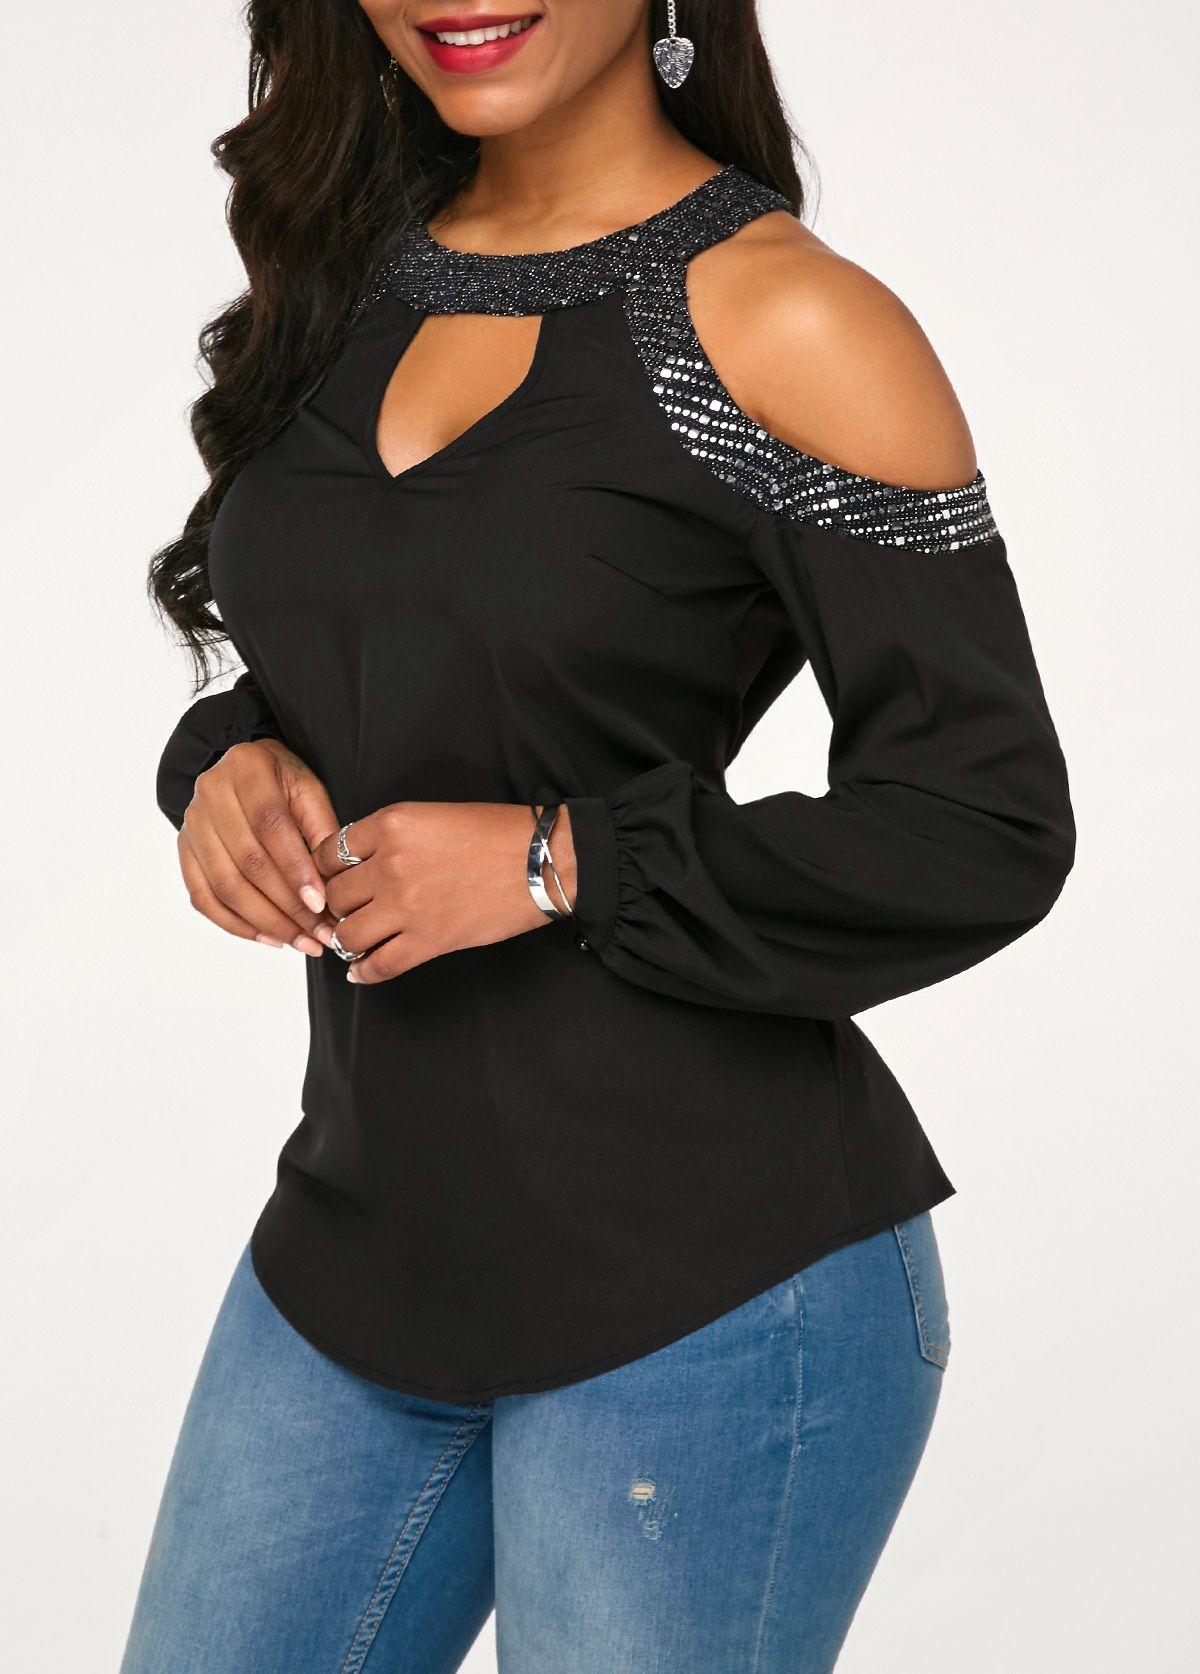 5f53e1acf3d6 Cold Shoulder Long Sleeve Black Blouse | Rotita.com - USD $26.58 ...